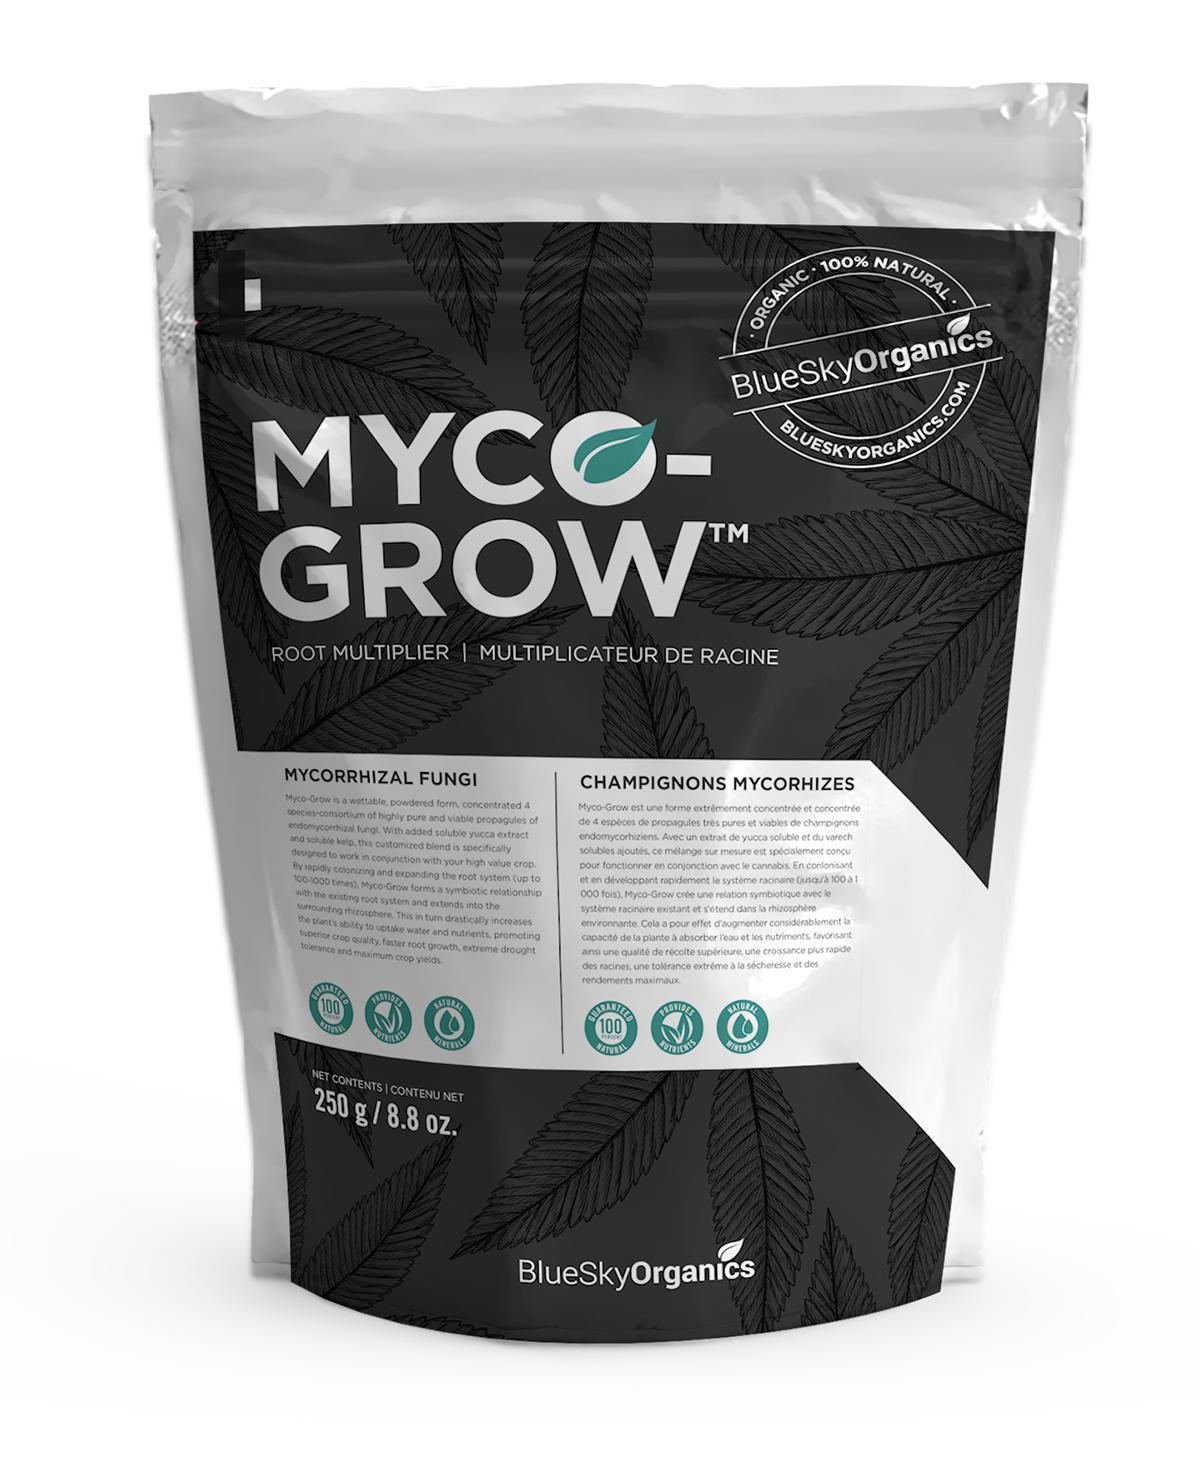 BlueSky Organics Myco-Grow